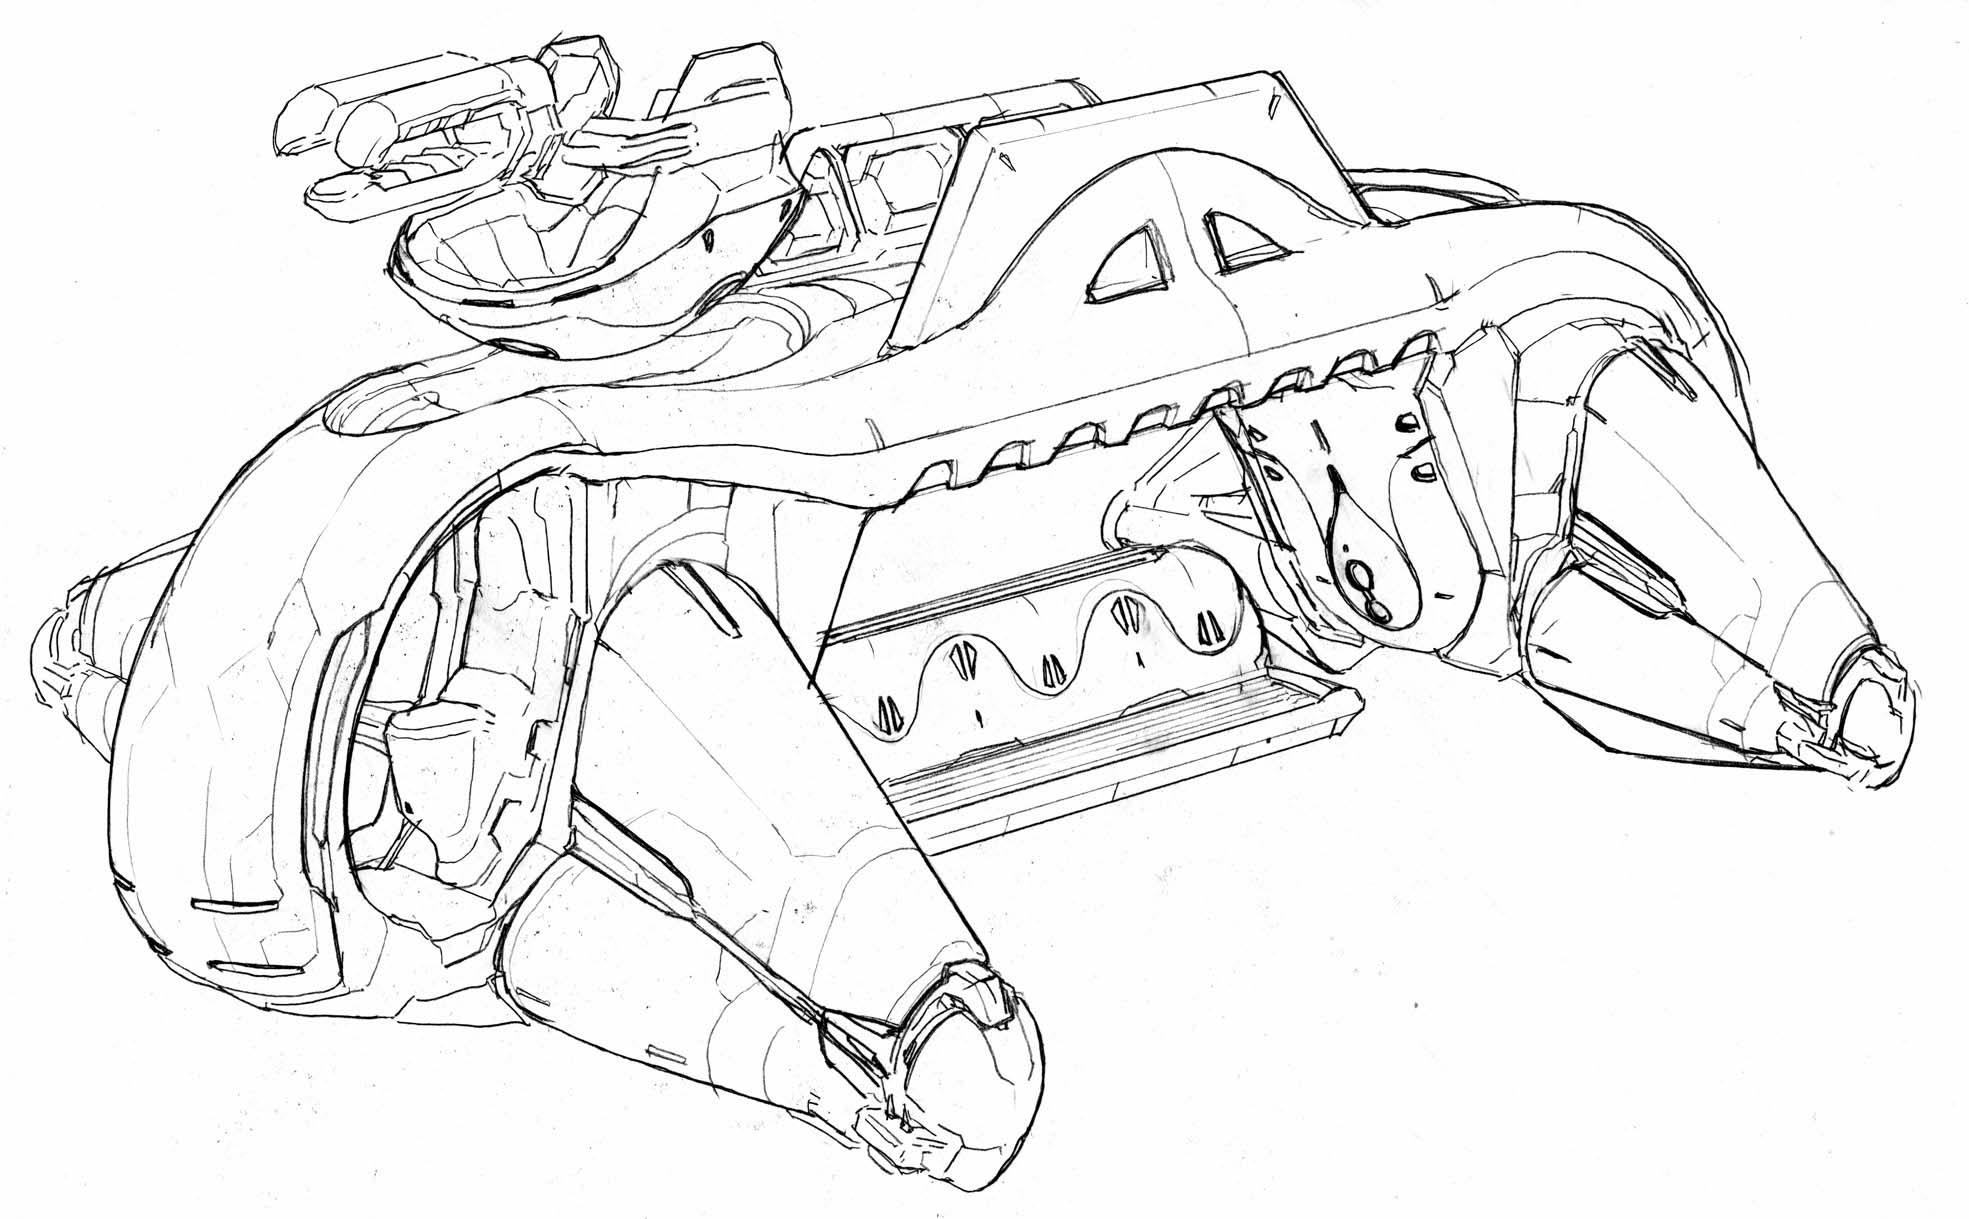 Halo 2 Concept Art